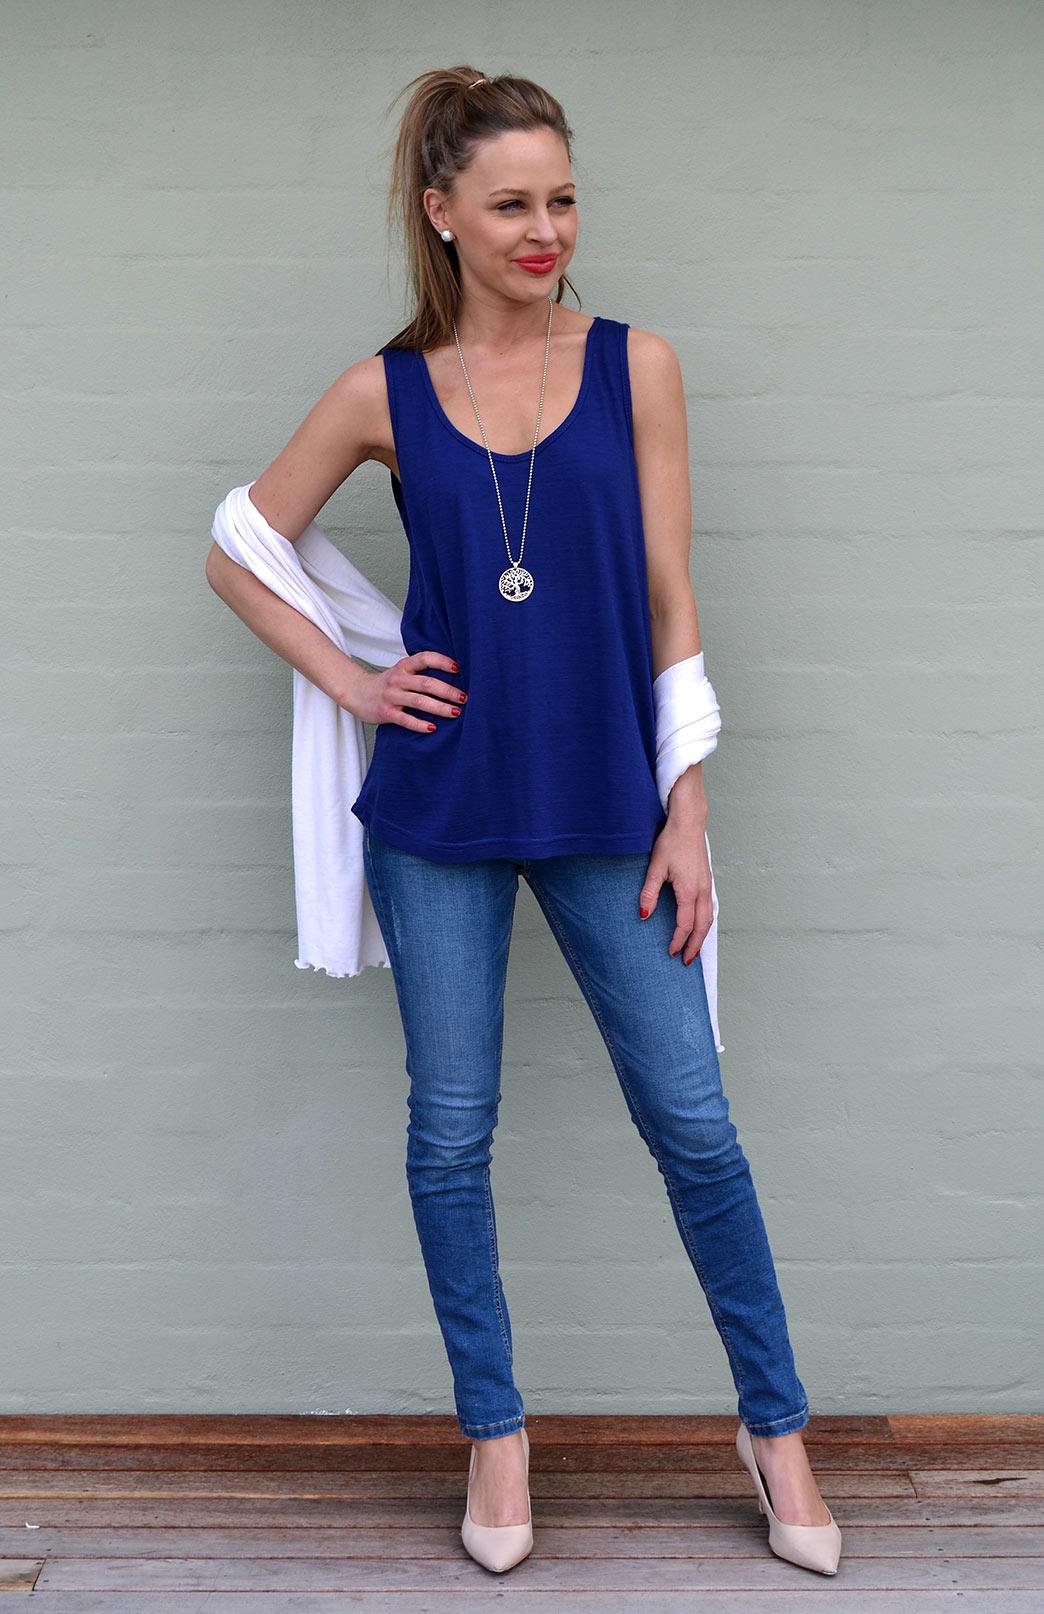 Tank Top - Women's Sapphire Blue Wool Summer Tank Top - Smitten Merino Tasmania Australia